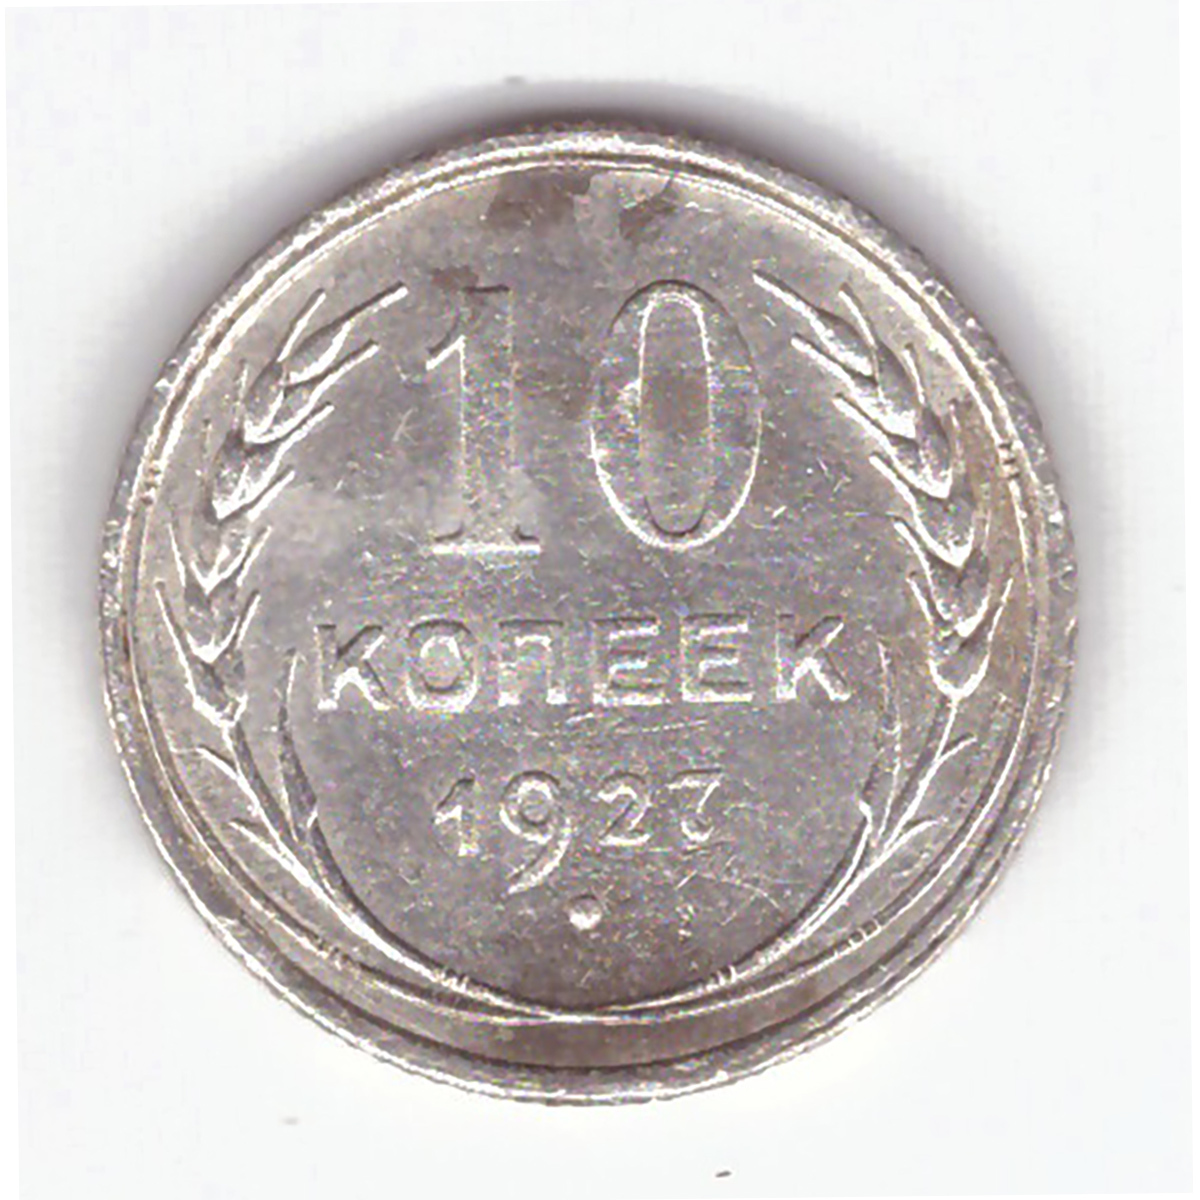 10 копеек 1927 года F №4